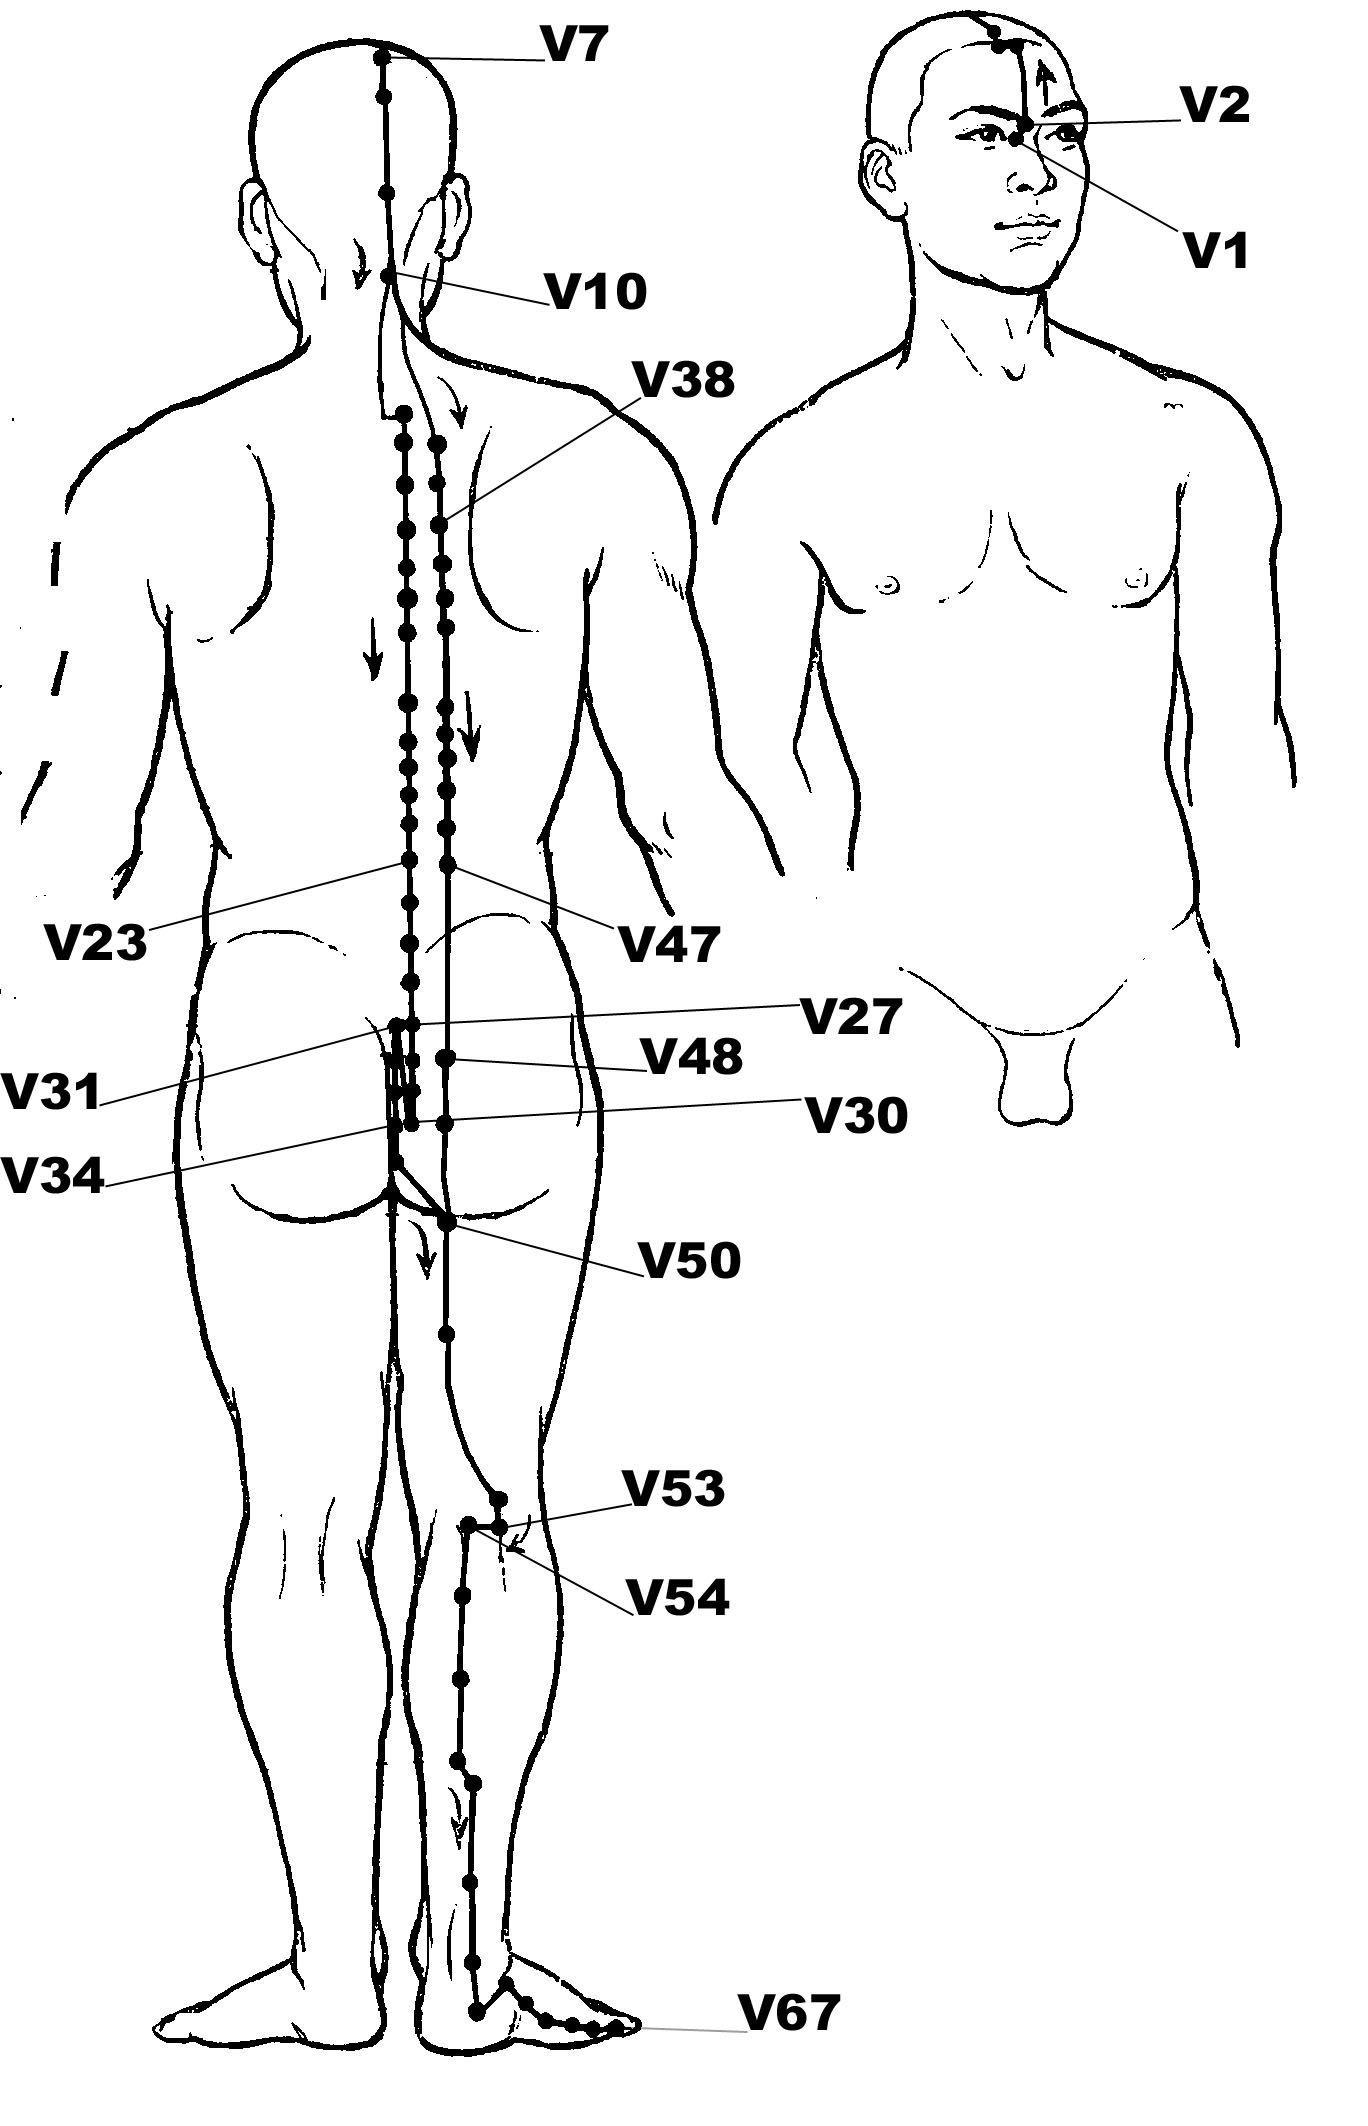 Localisation Des Points D Acupuncture : localisation, points, acupuncture, Méridien, Vessie:, Trajet, Points, D'acupression, Principaux, Acupression,, Medecine, Chinoise,, Acuponcture